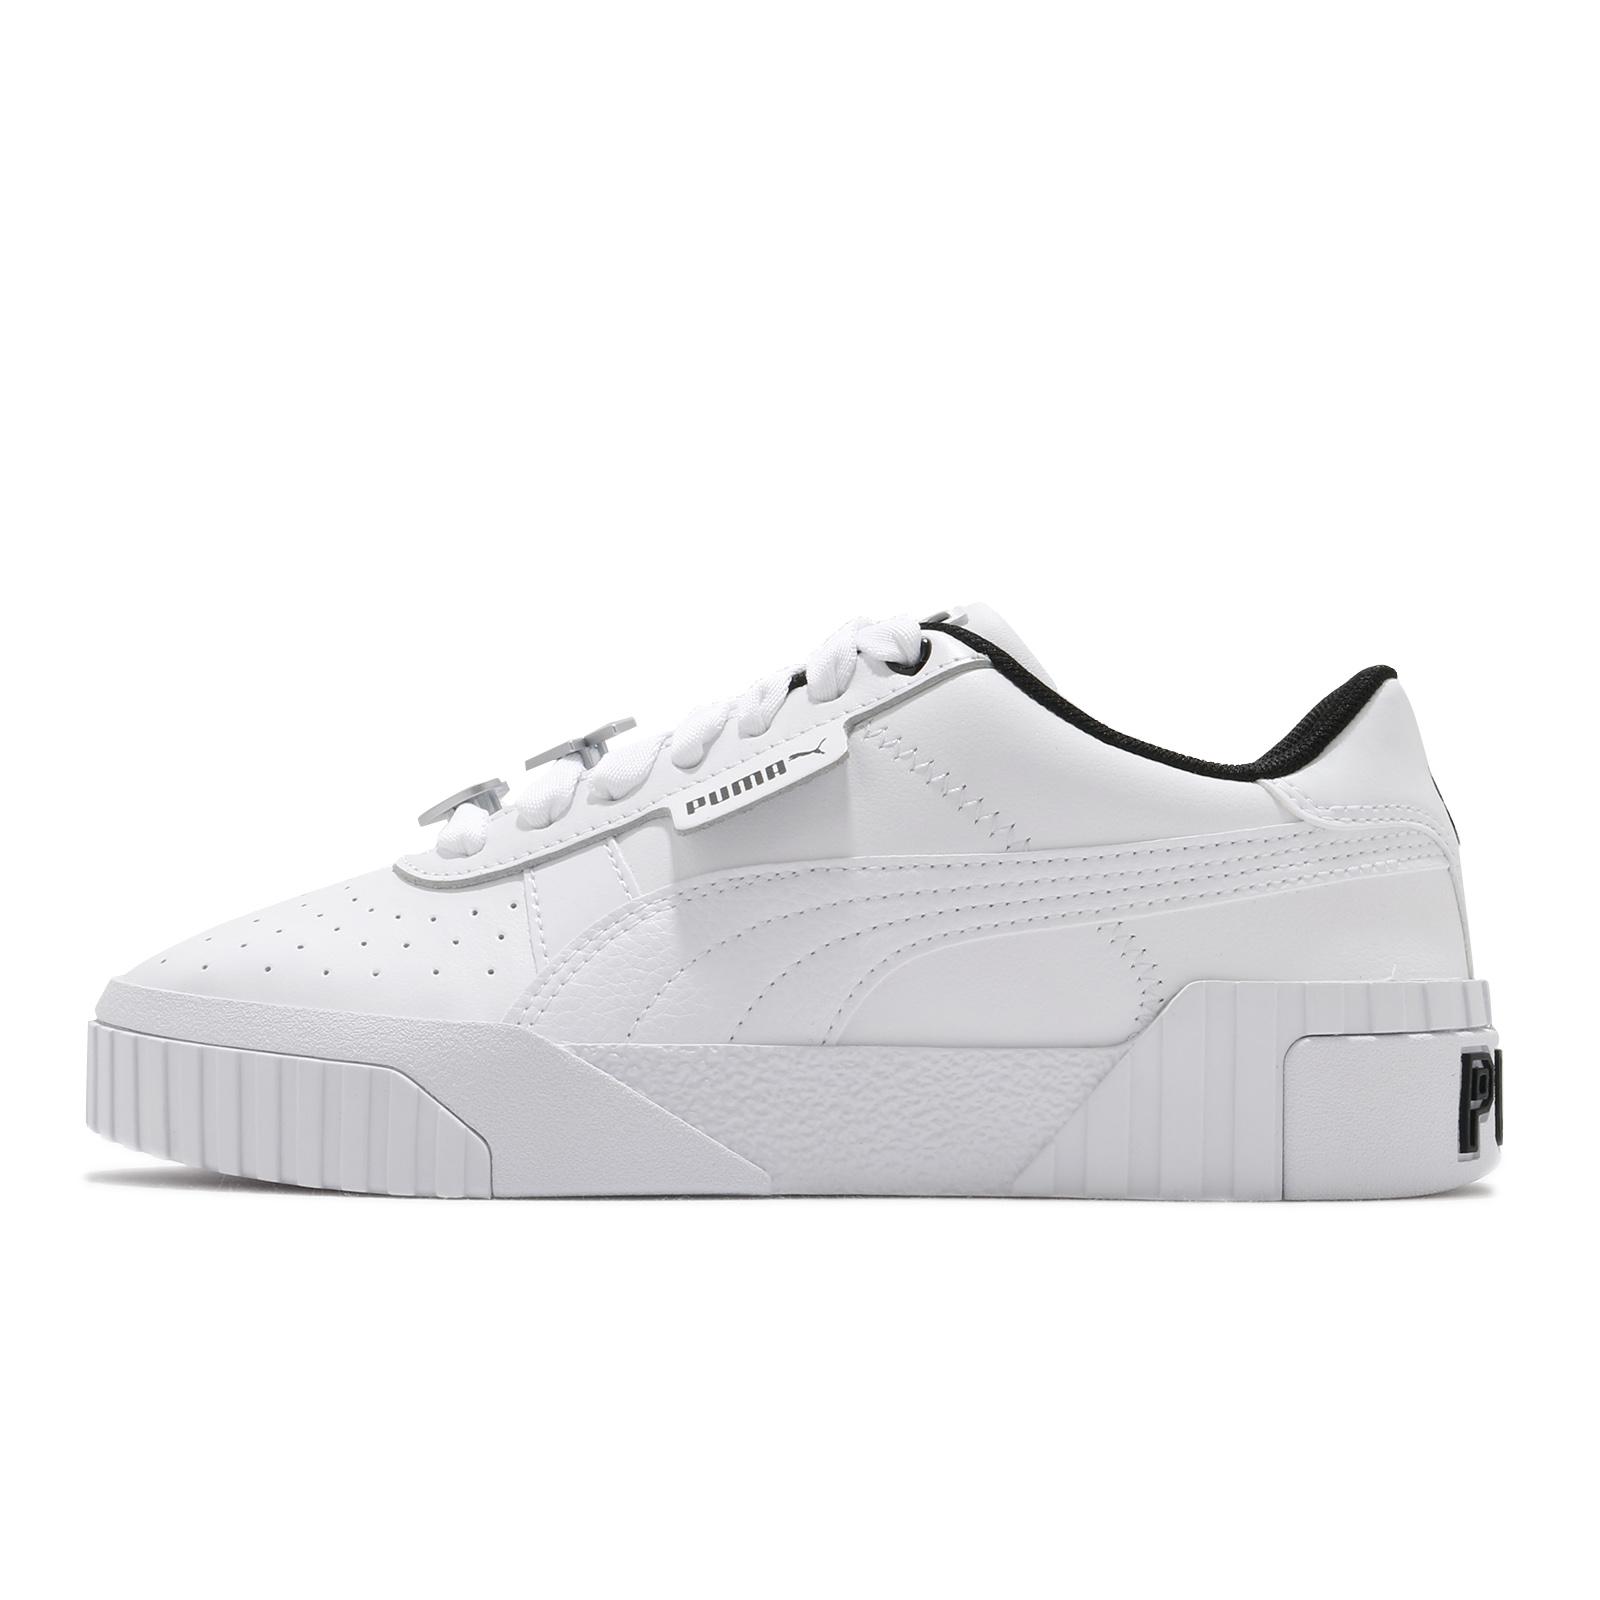 Puma 休閒鞋 Cali Galentines Wns 白 黑 女鞋 厚底 增高 愛心【ACS】 37495002